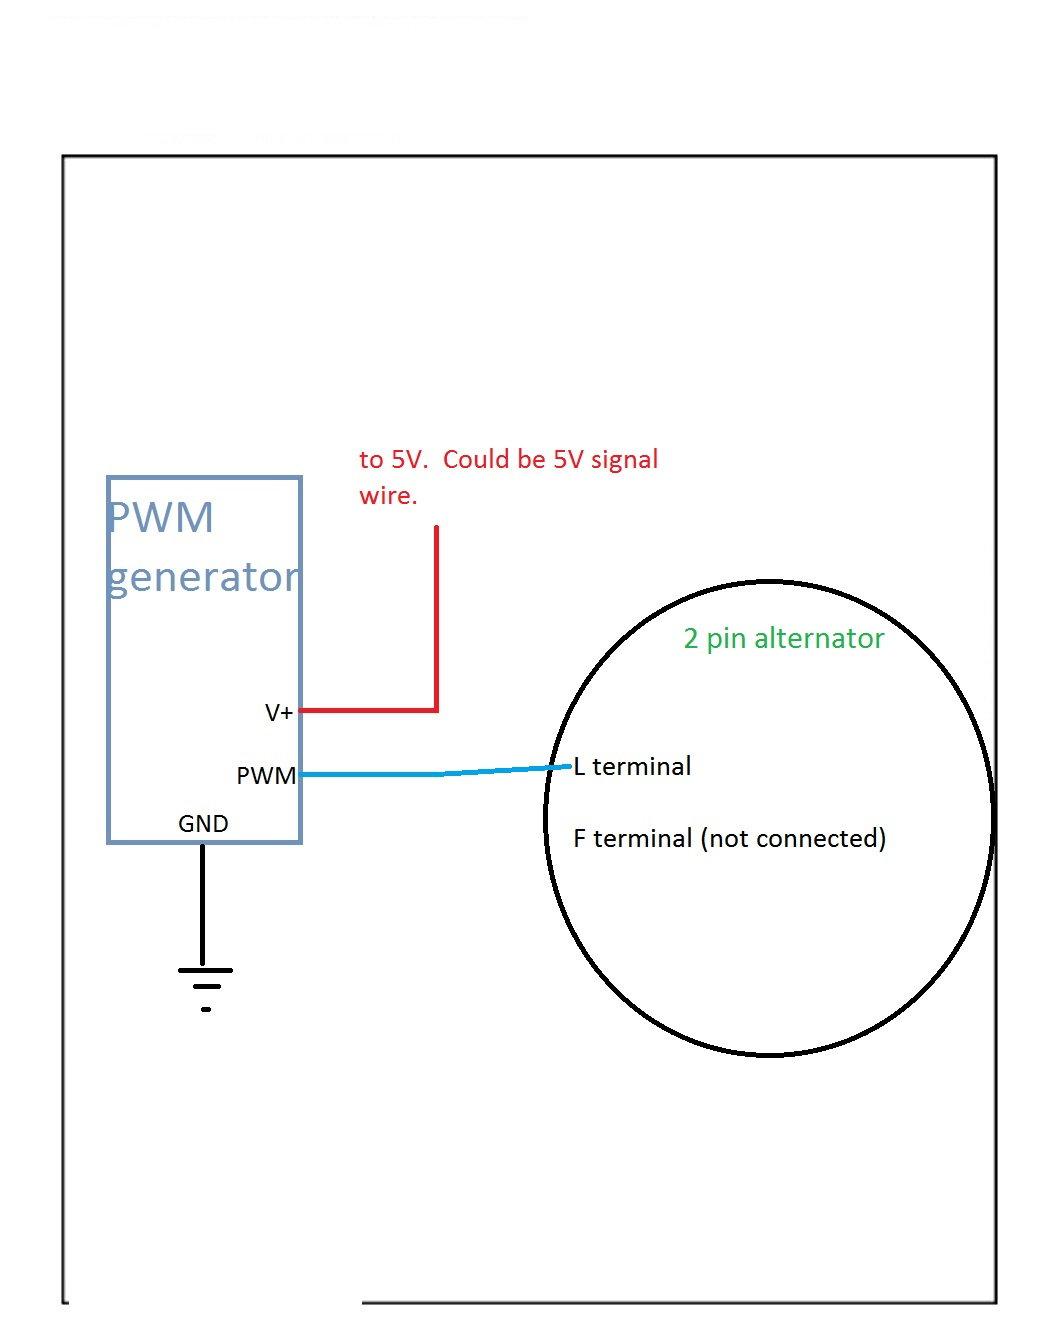 2 pin 2006 + alternator. don't throw it away!! - ls1tech - camaro and  firebird forum discussion  ls1tech.com